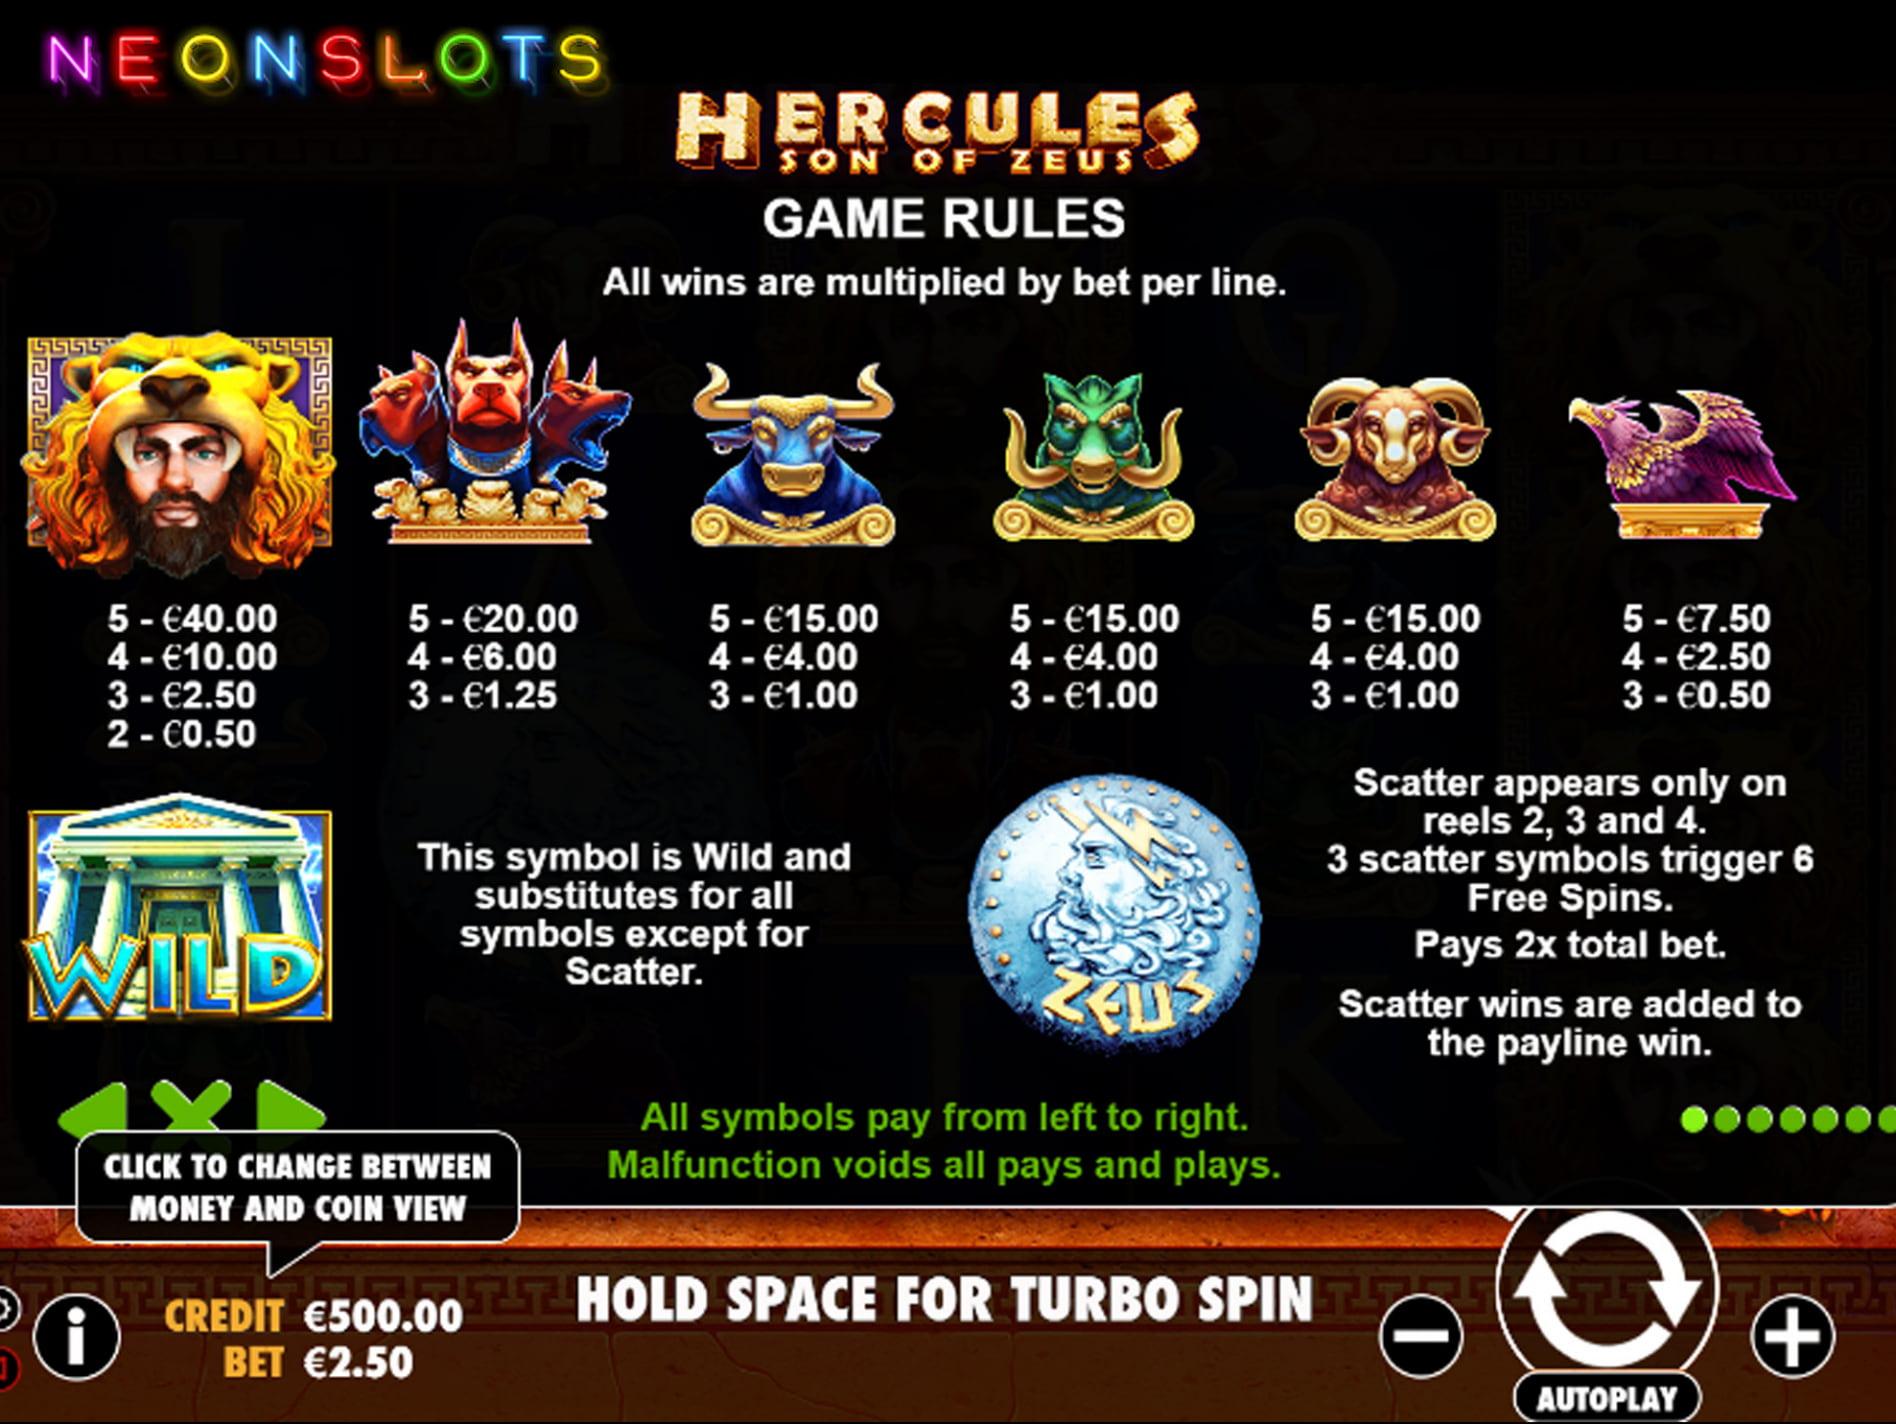 Juegos de bingo gratis tragamonedas giros casino Concepción - 44867